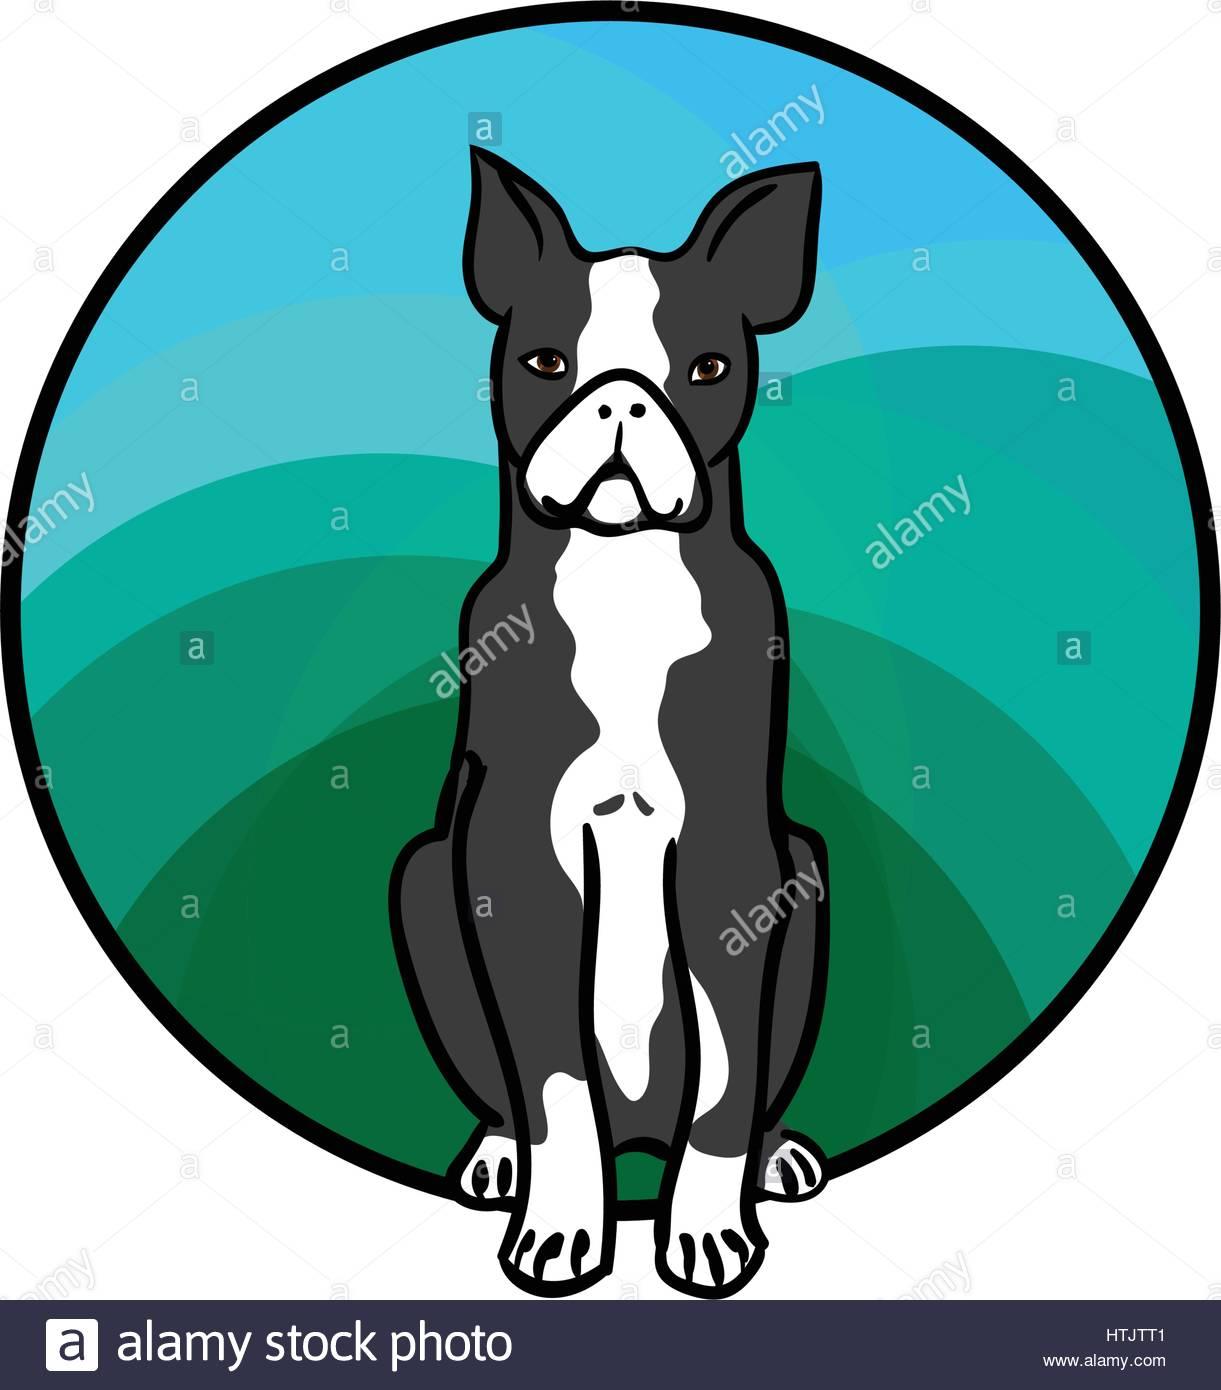 1221x1390 Boston Terrier Dog Vector Vectors Stock Photos Amp Boston Terrier